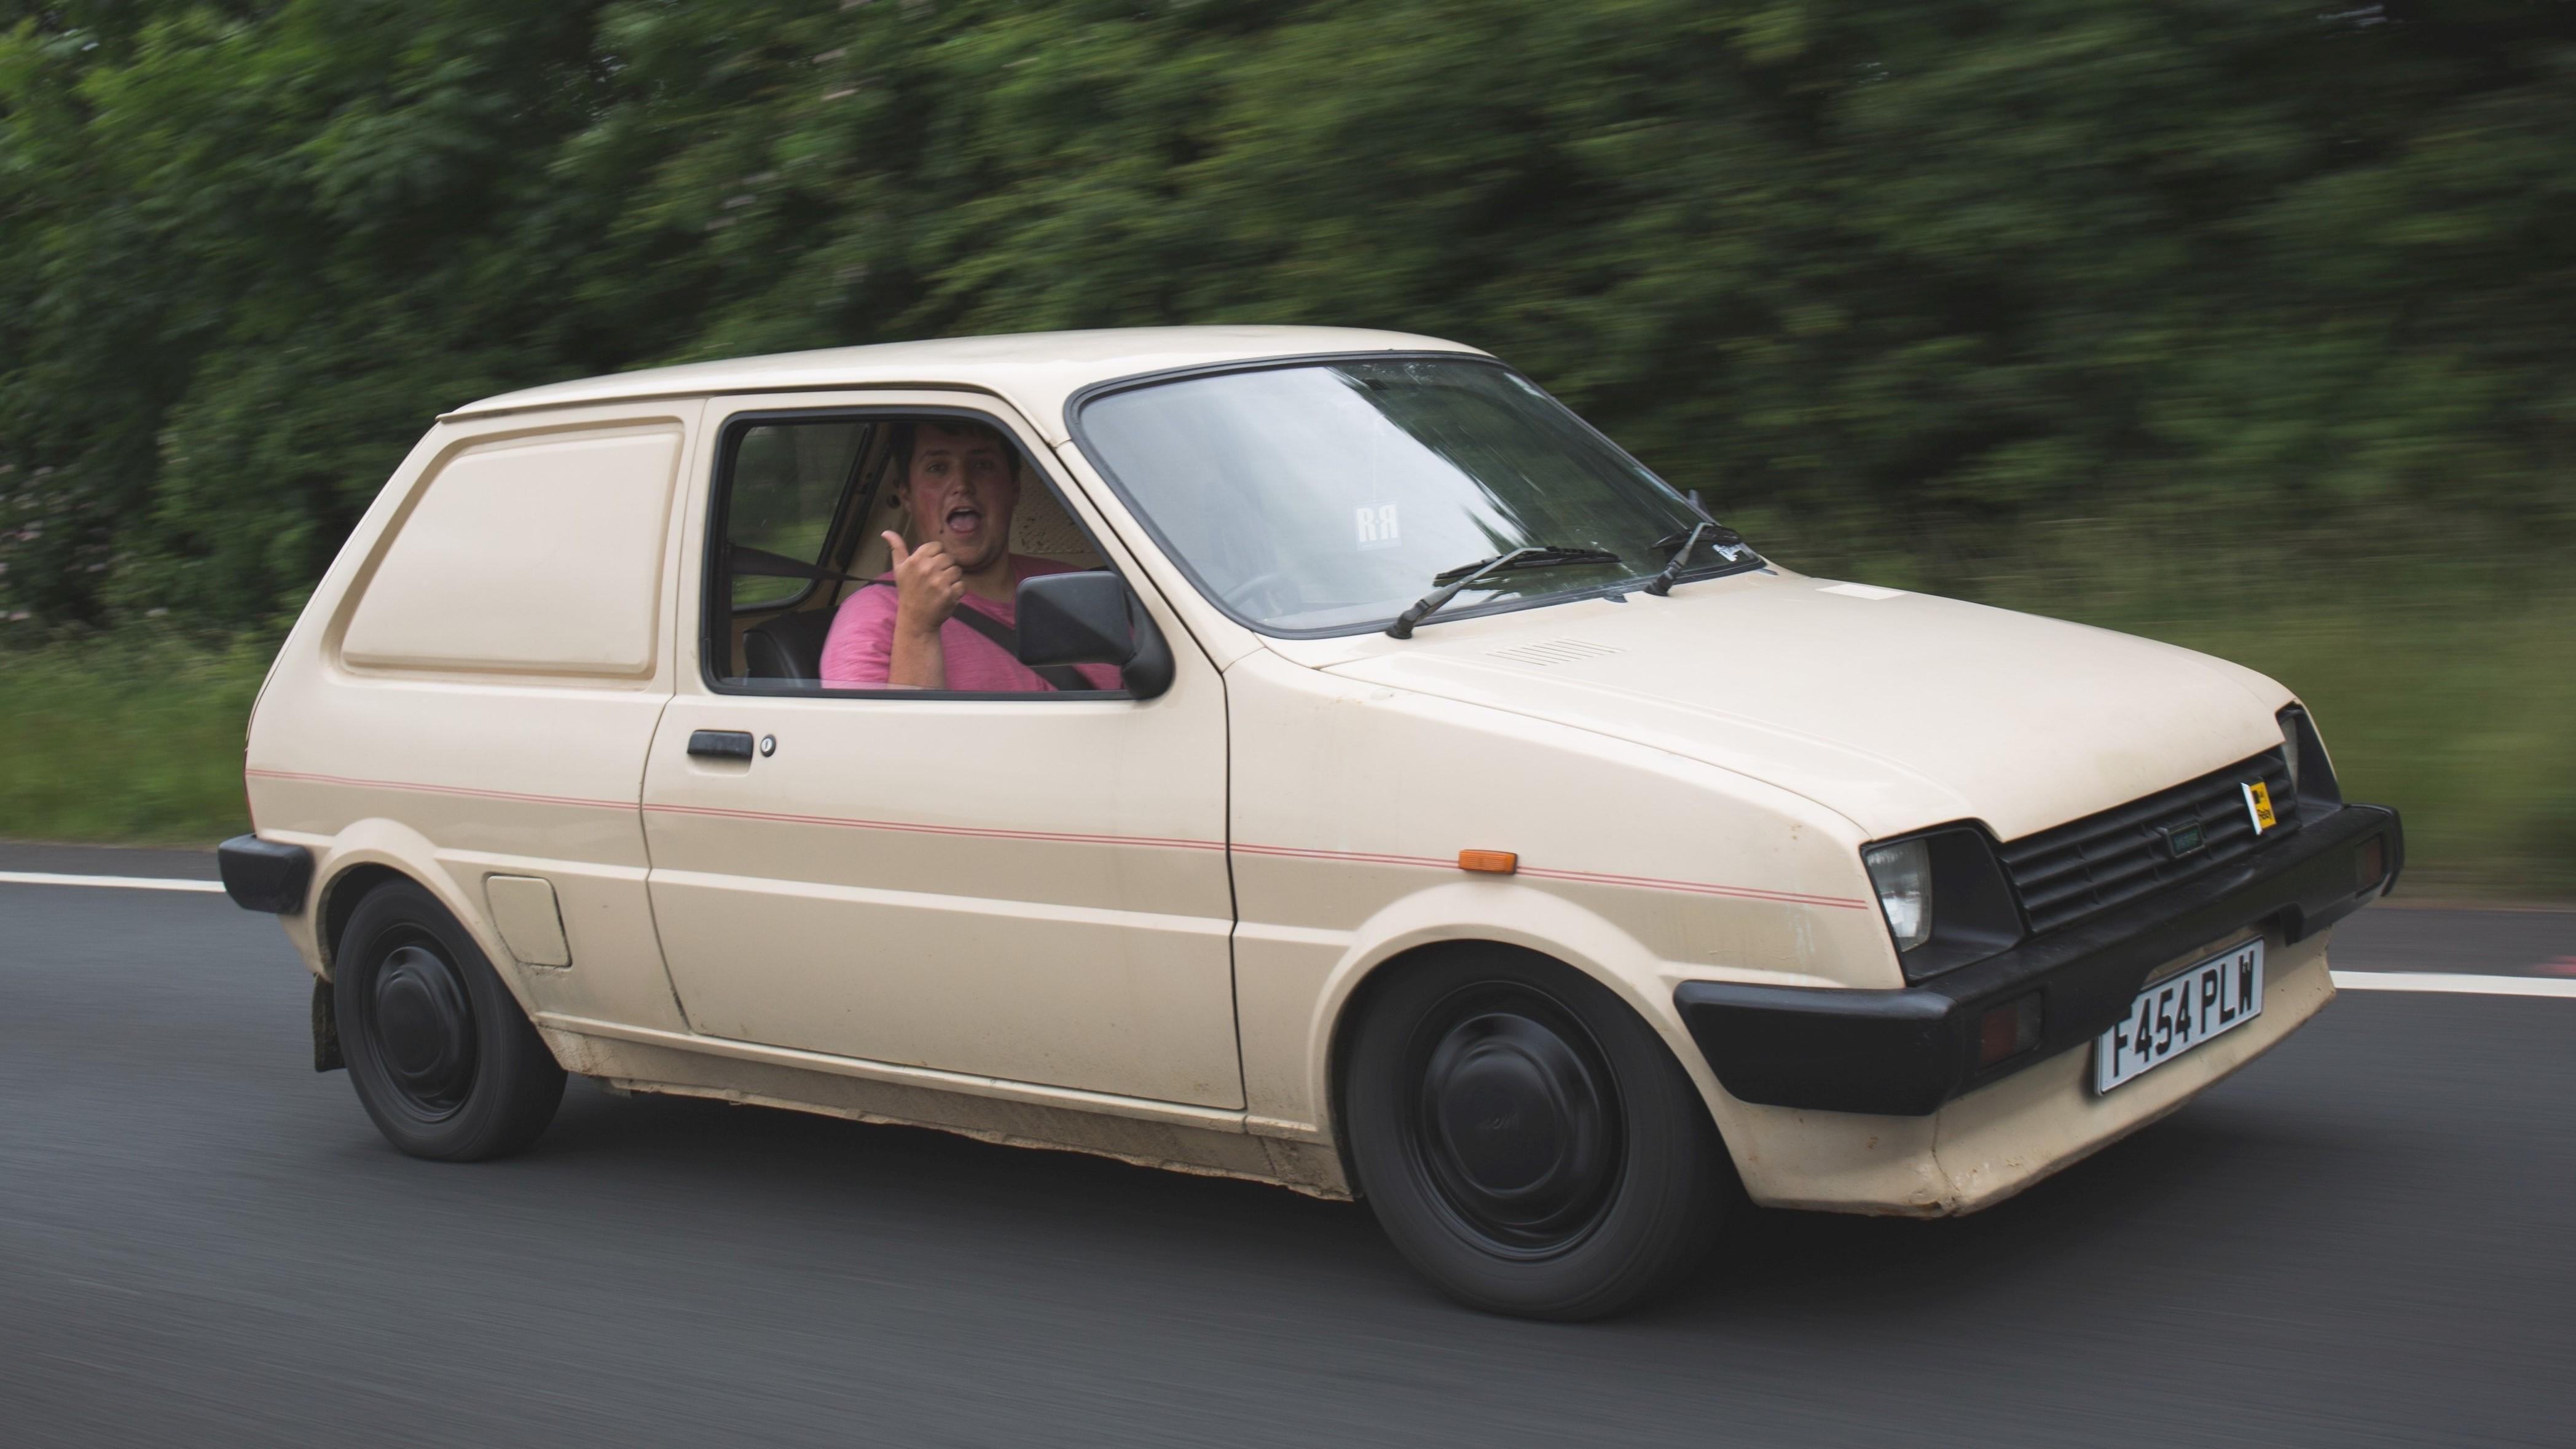 Jon Leake's Van